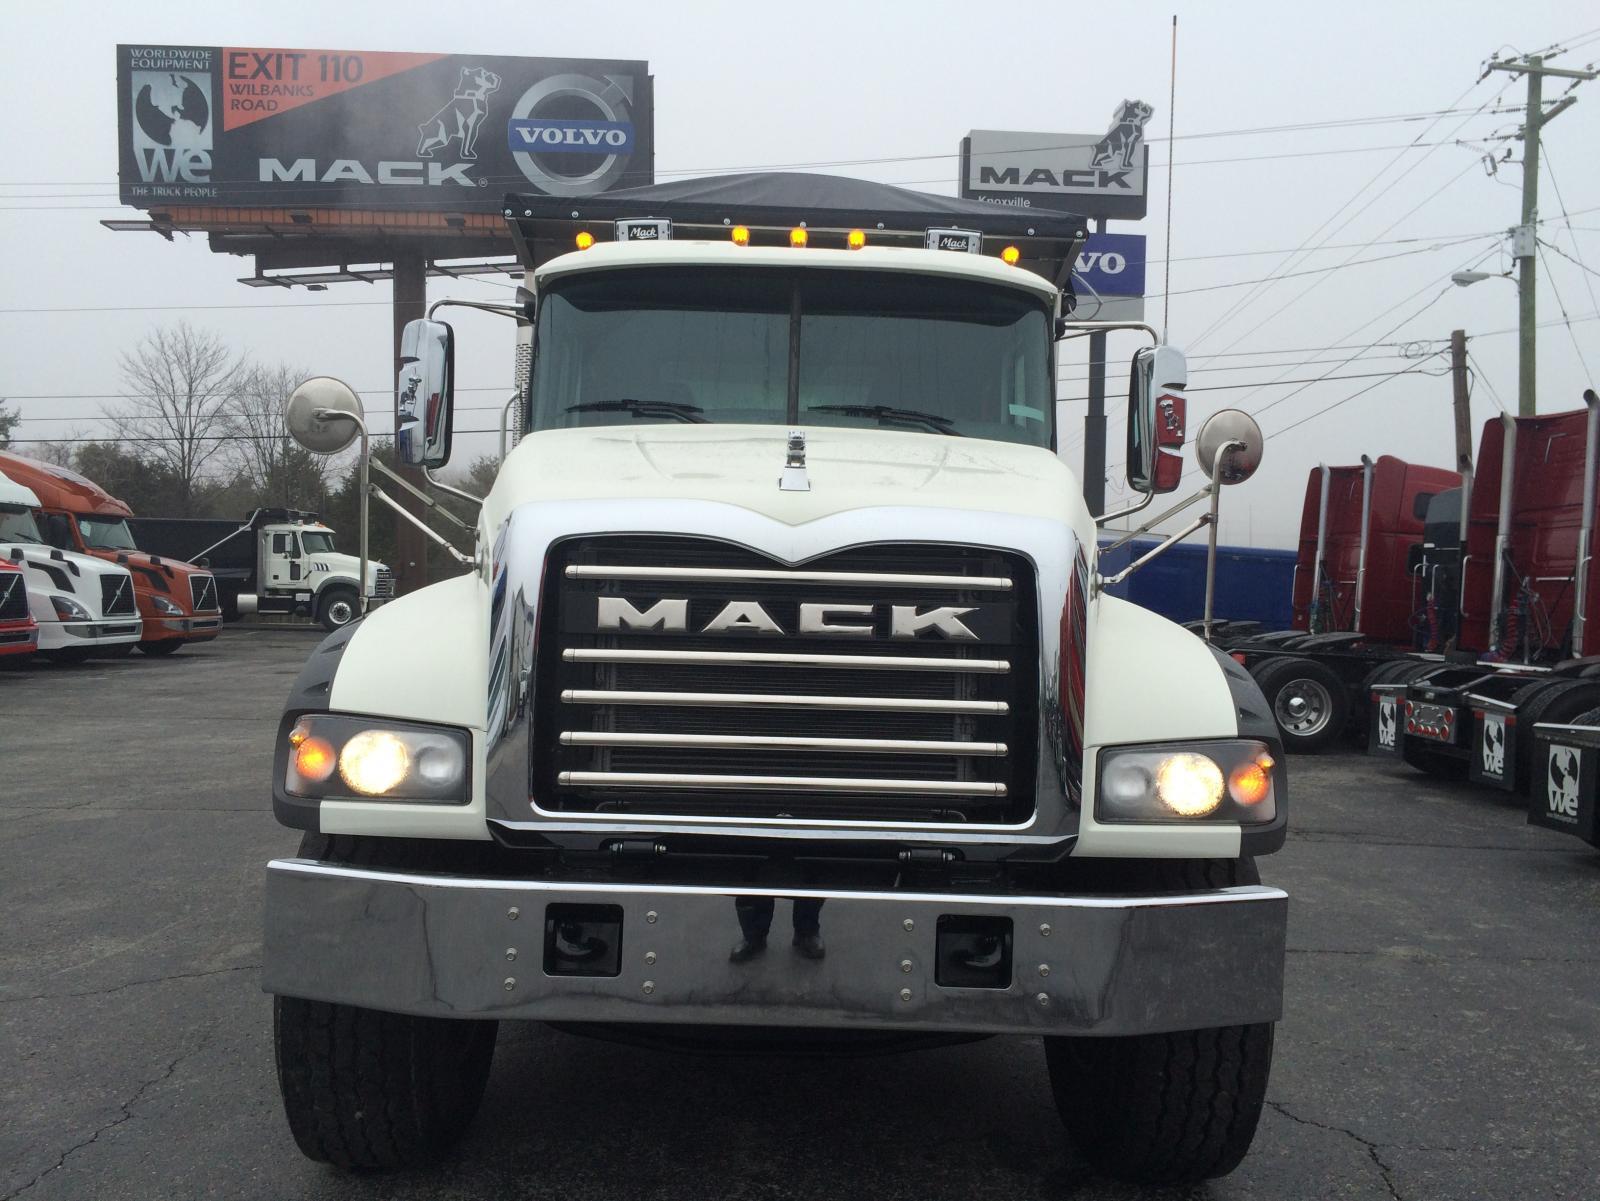 Mack Quad Dump Trucks : Mack gu quad axle dump trucks modern truck